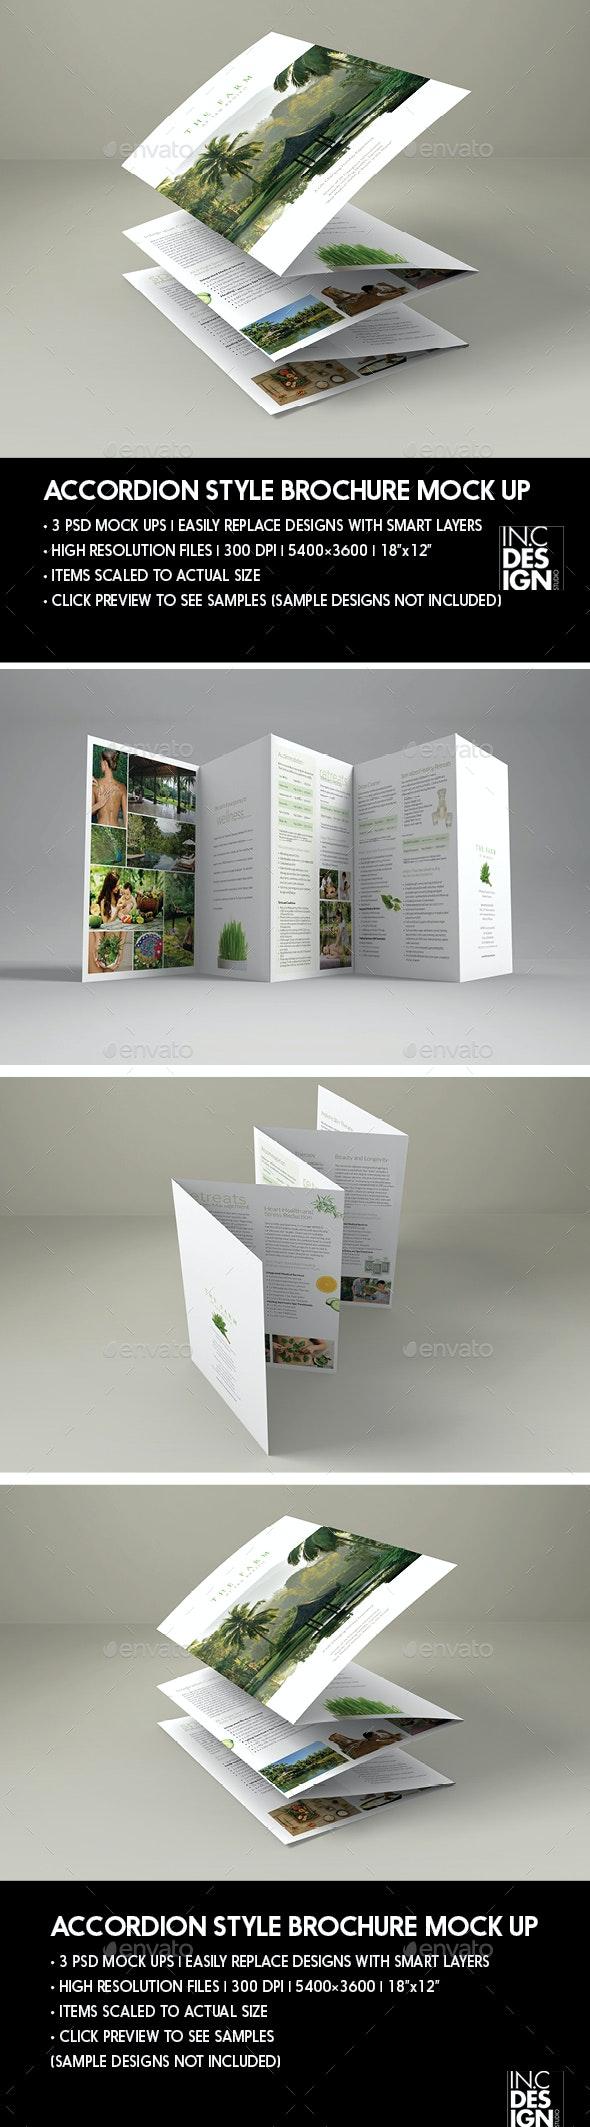 Elegant Accordion Style Brochure Mock Up - Brochures Print